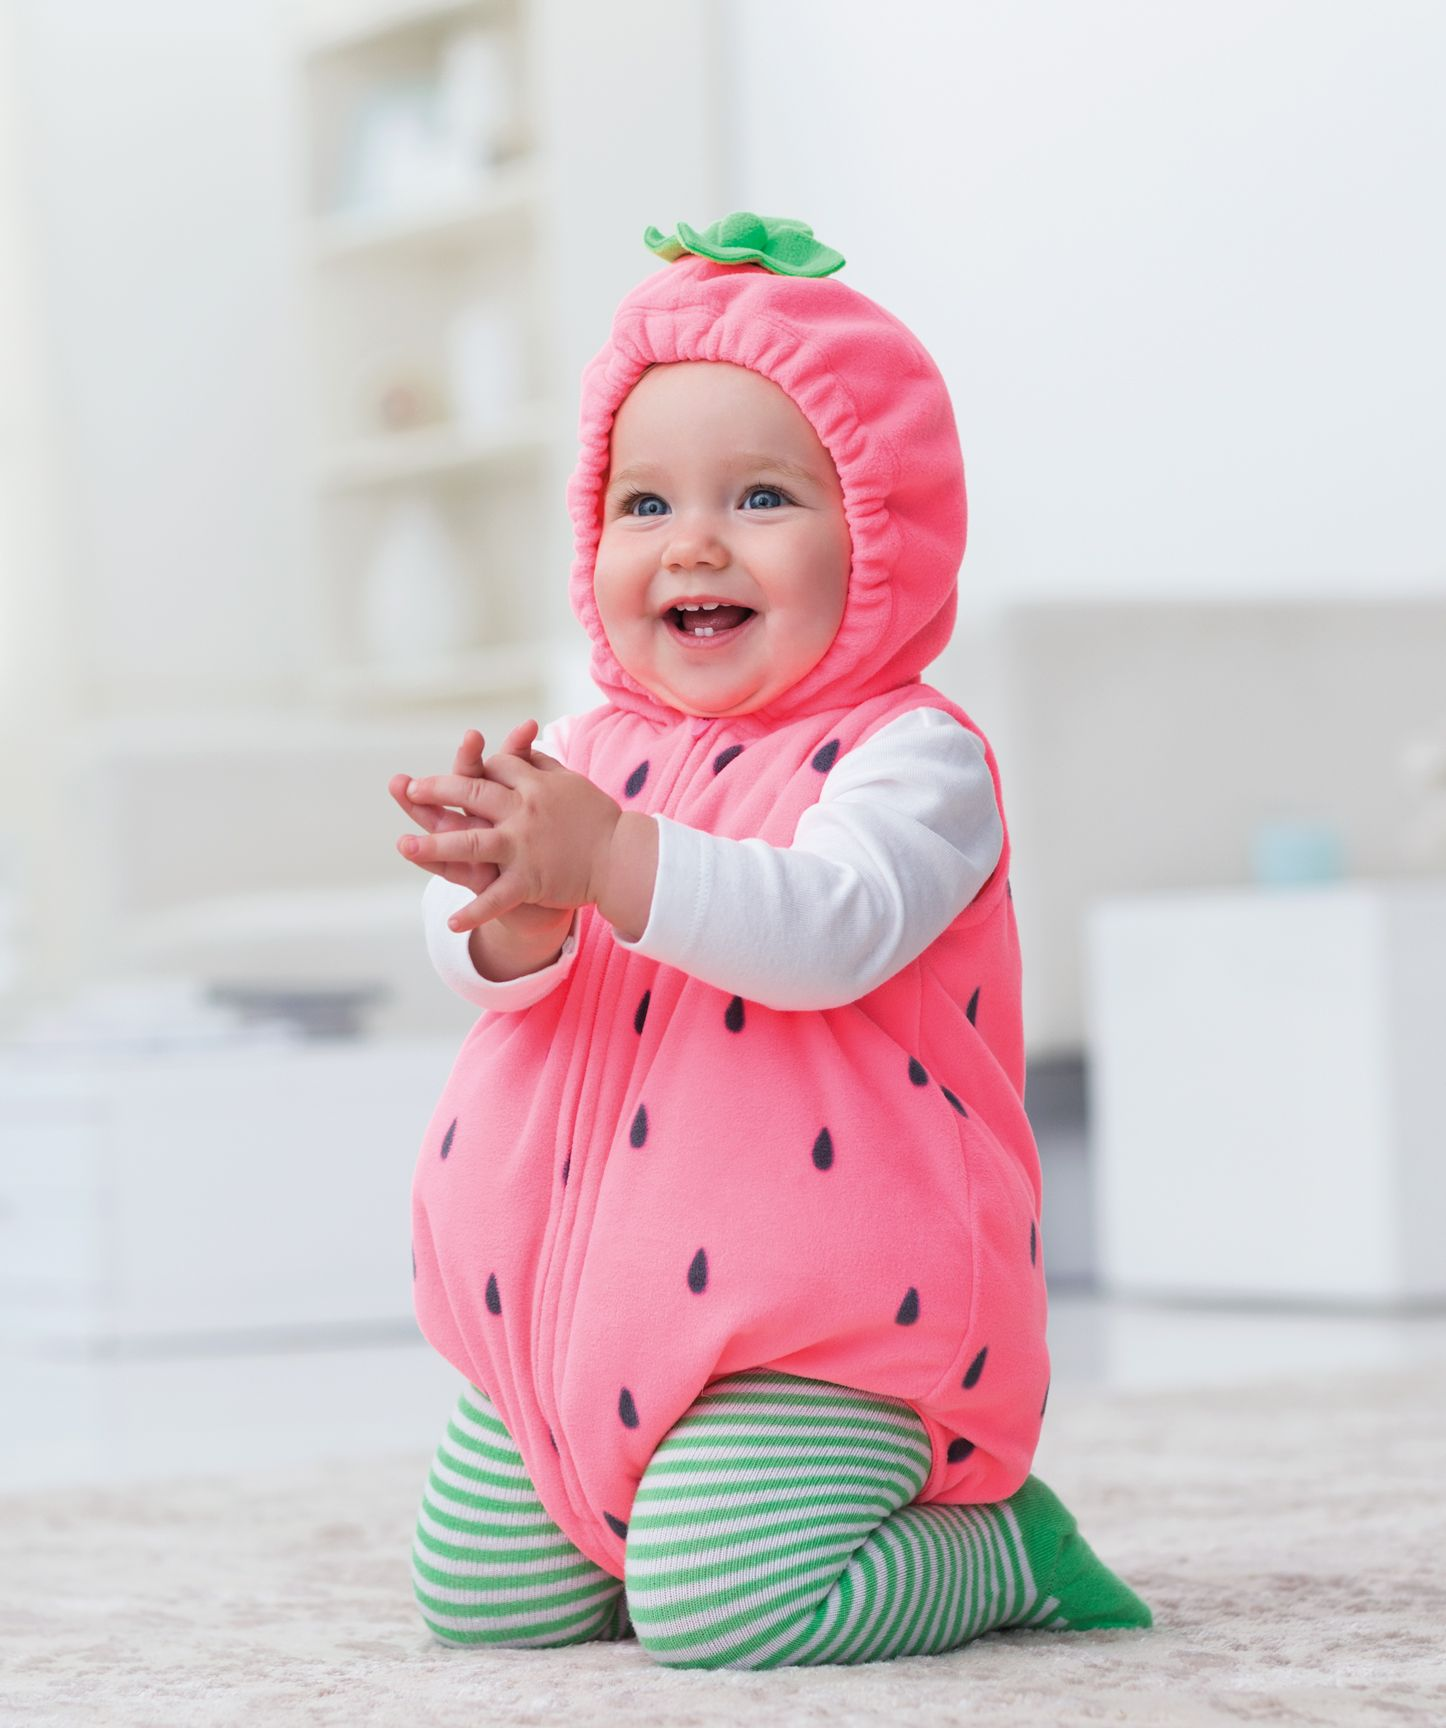 339ef7212656 Little Strawberry Baby Halloween Costume  beallsflorida